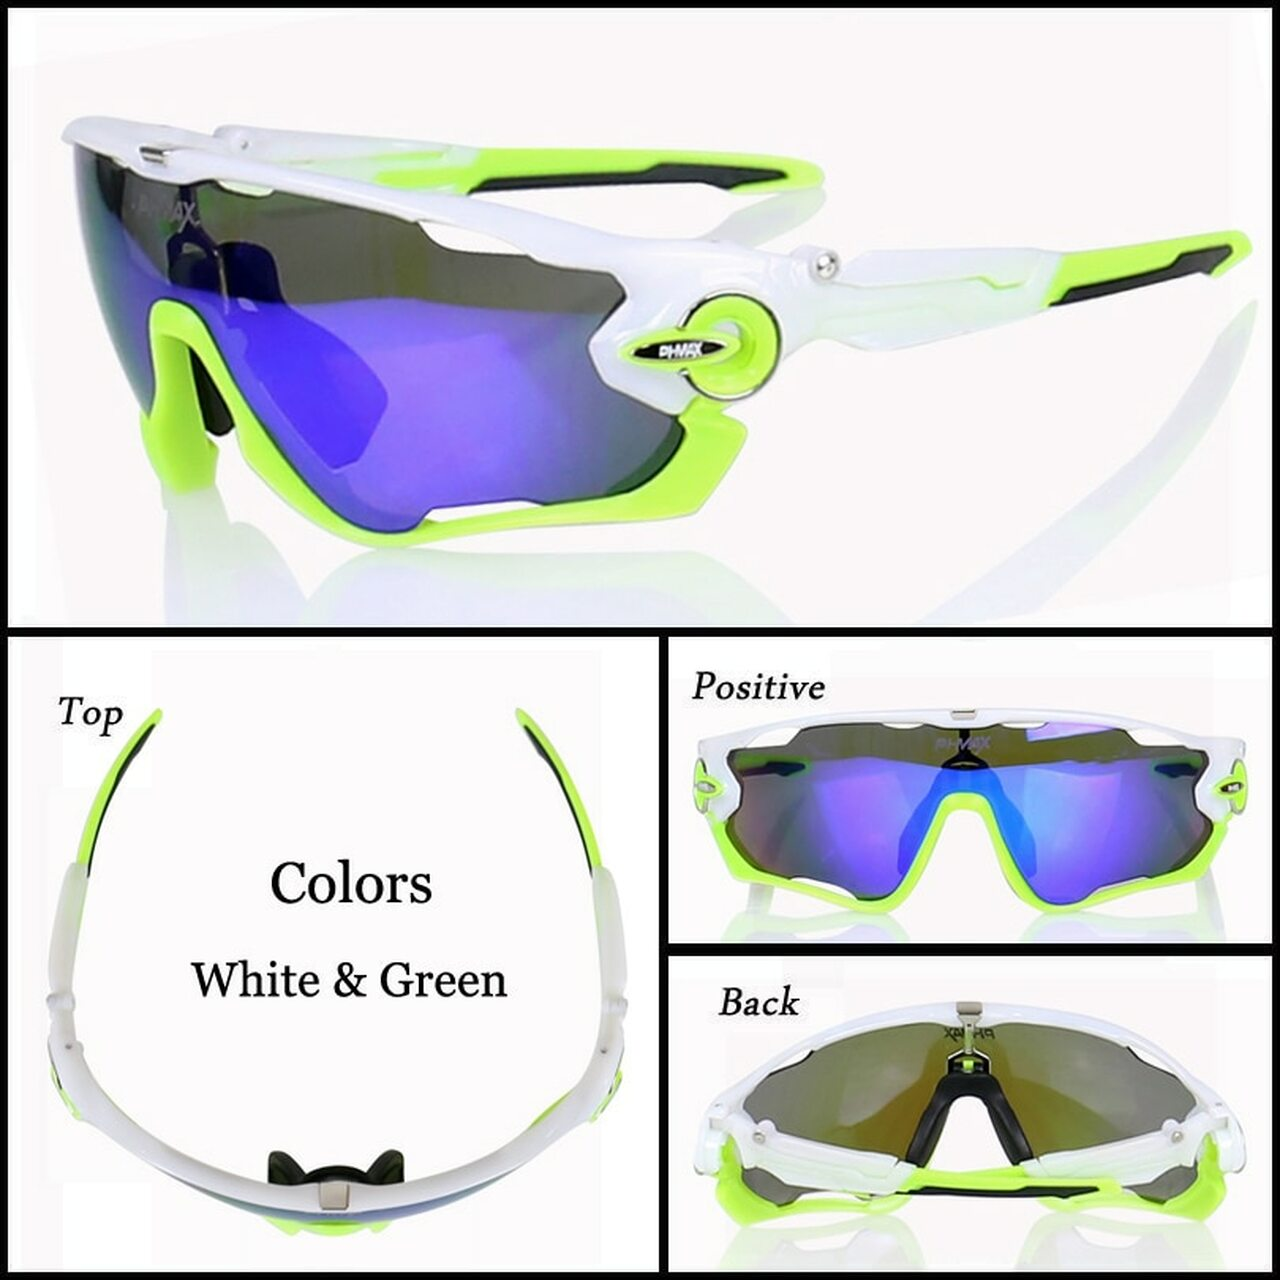 Polarized Sunglasses Sets Sport Mountain Bicycle Road Bike Cycling Sun Glasses